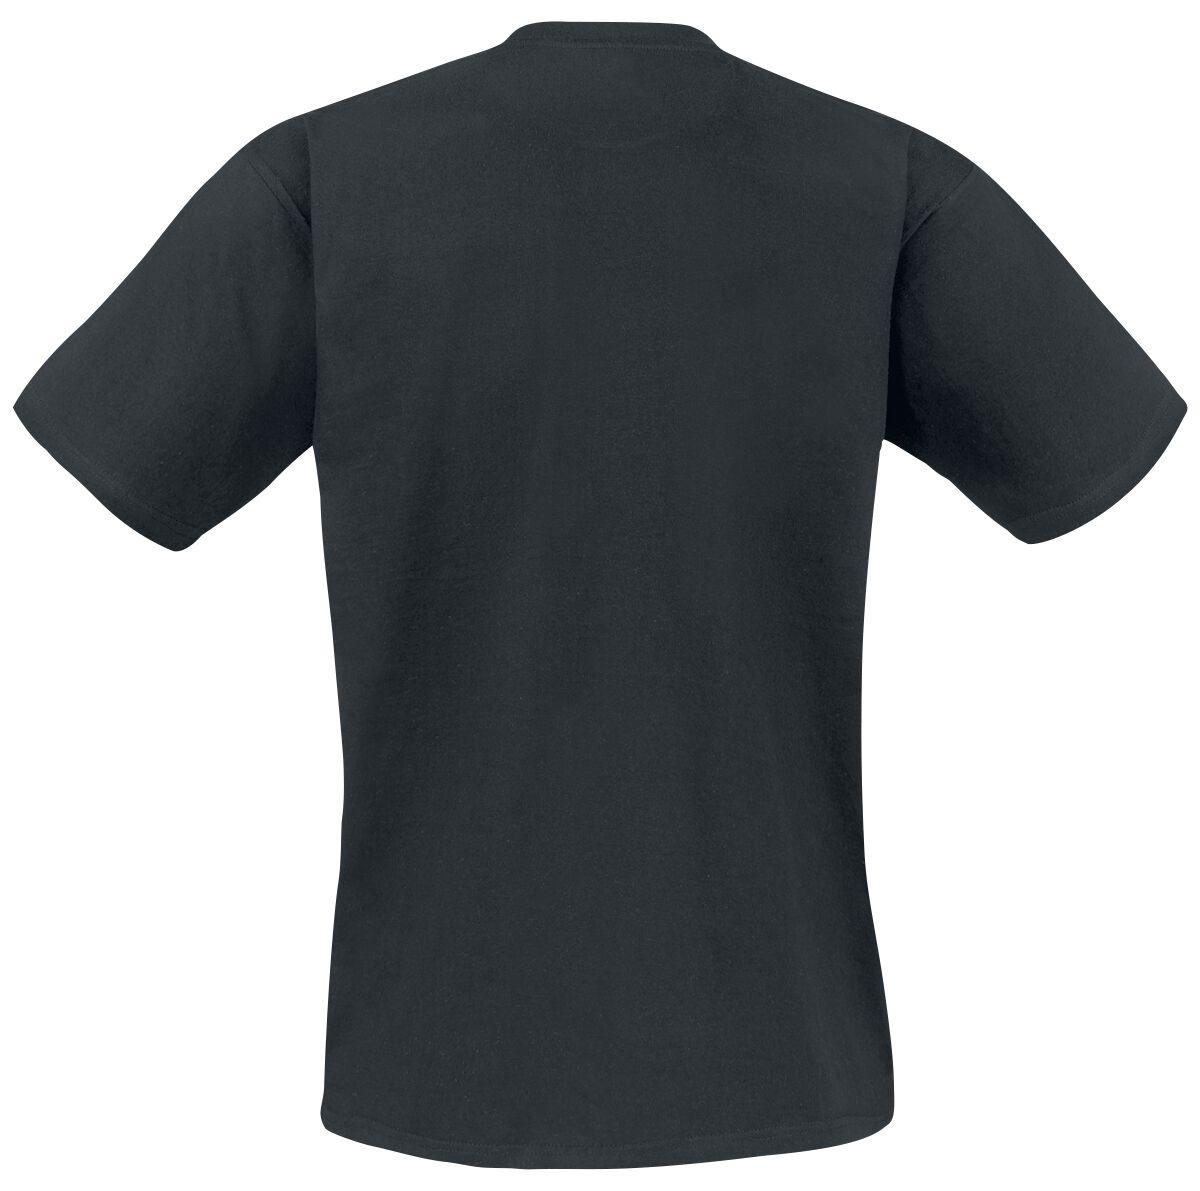 Starwars Kersttrui.Boba Fett Star Wars T Shirt Large